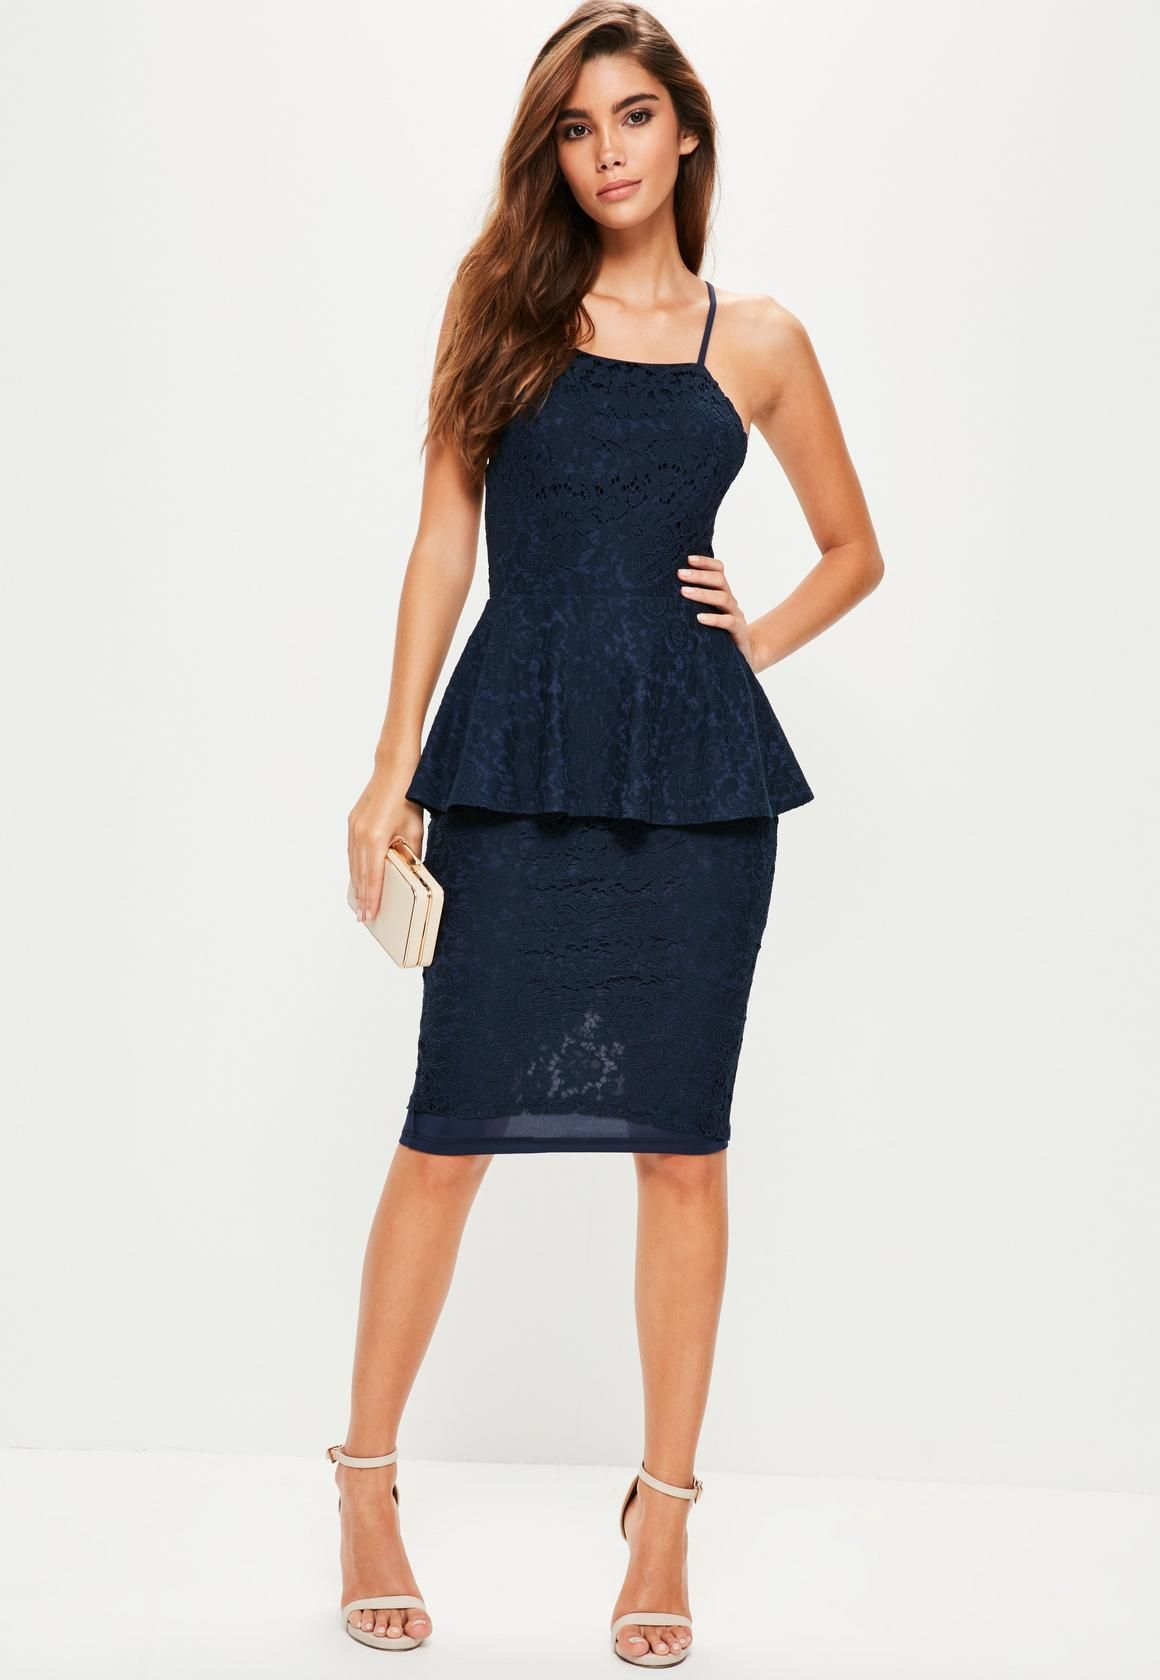 Missguided Navy Lace Peplum Midi Dress Peplum Midi Dress Women Dress Online Dresses